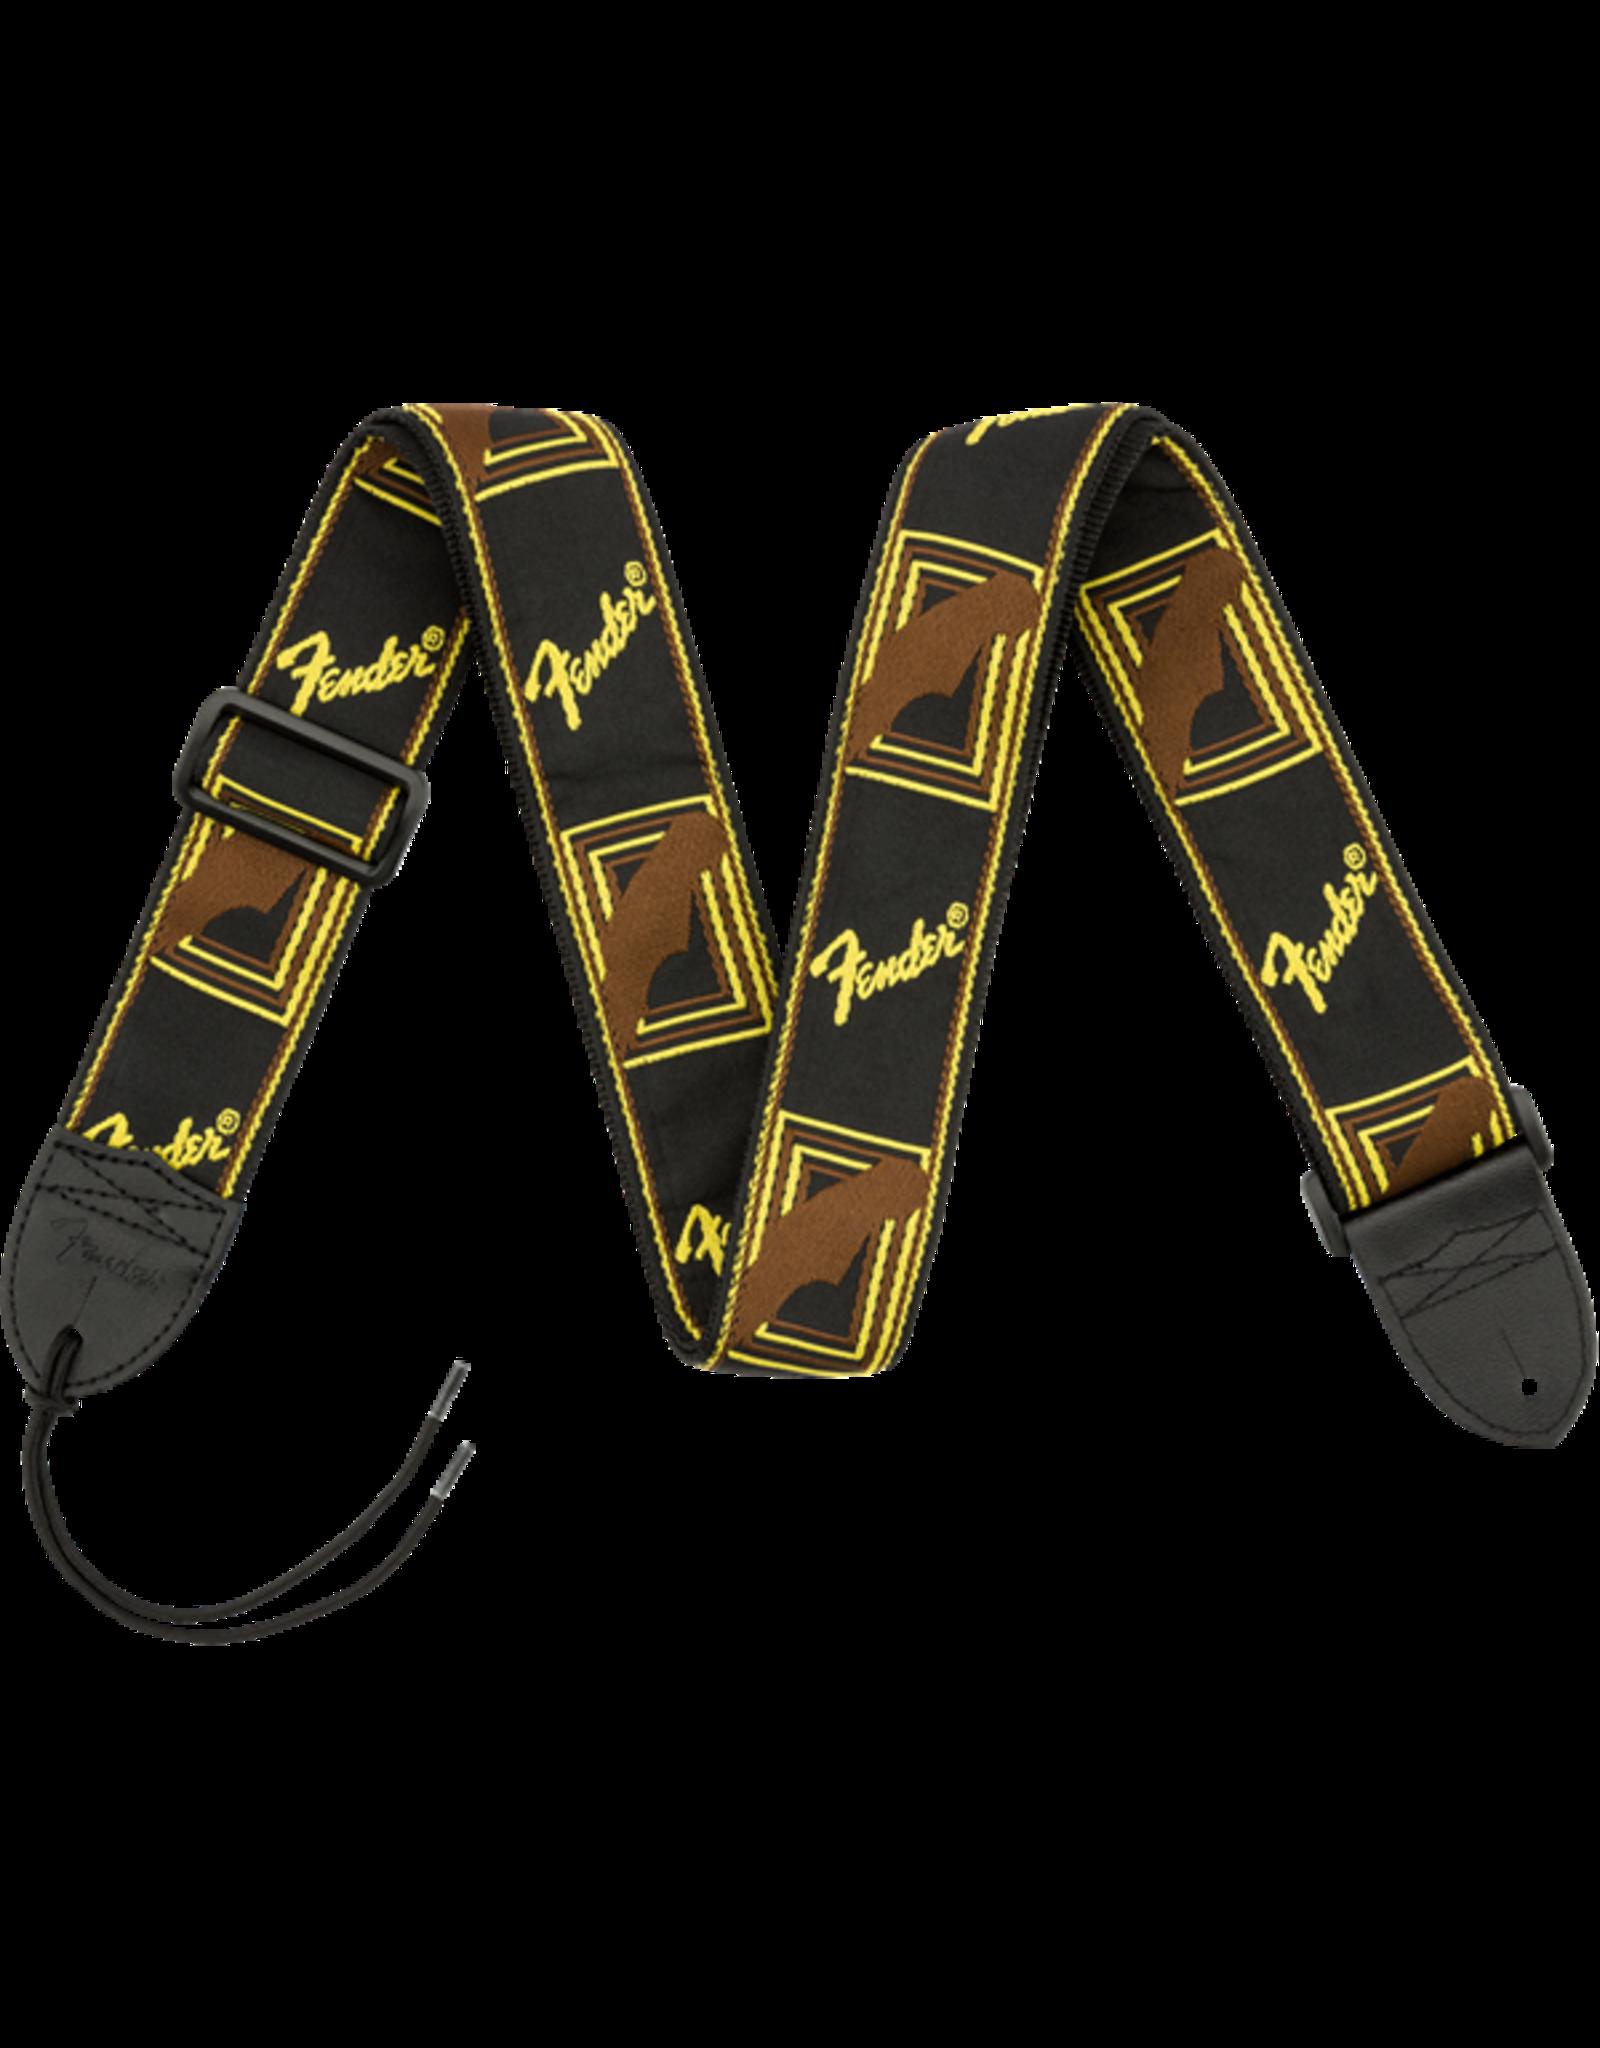 Fender Fender Monogrammed Black/Yellow/Brown strap